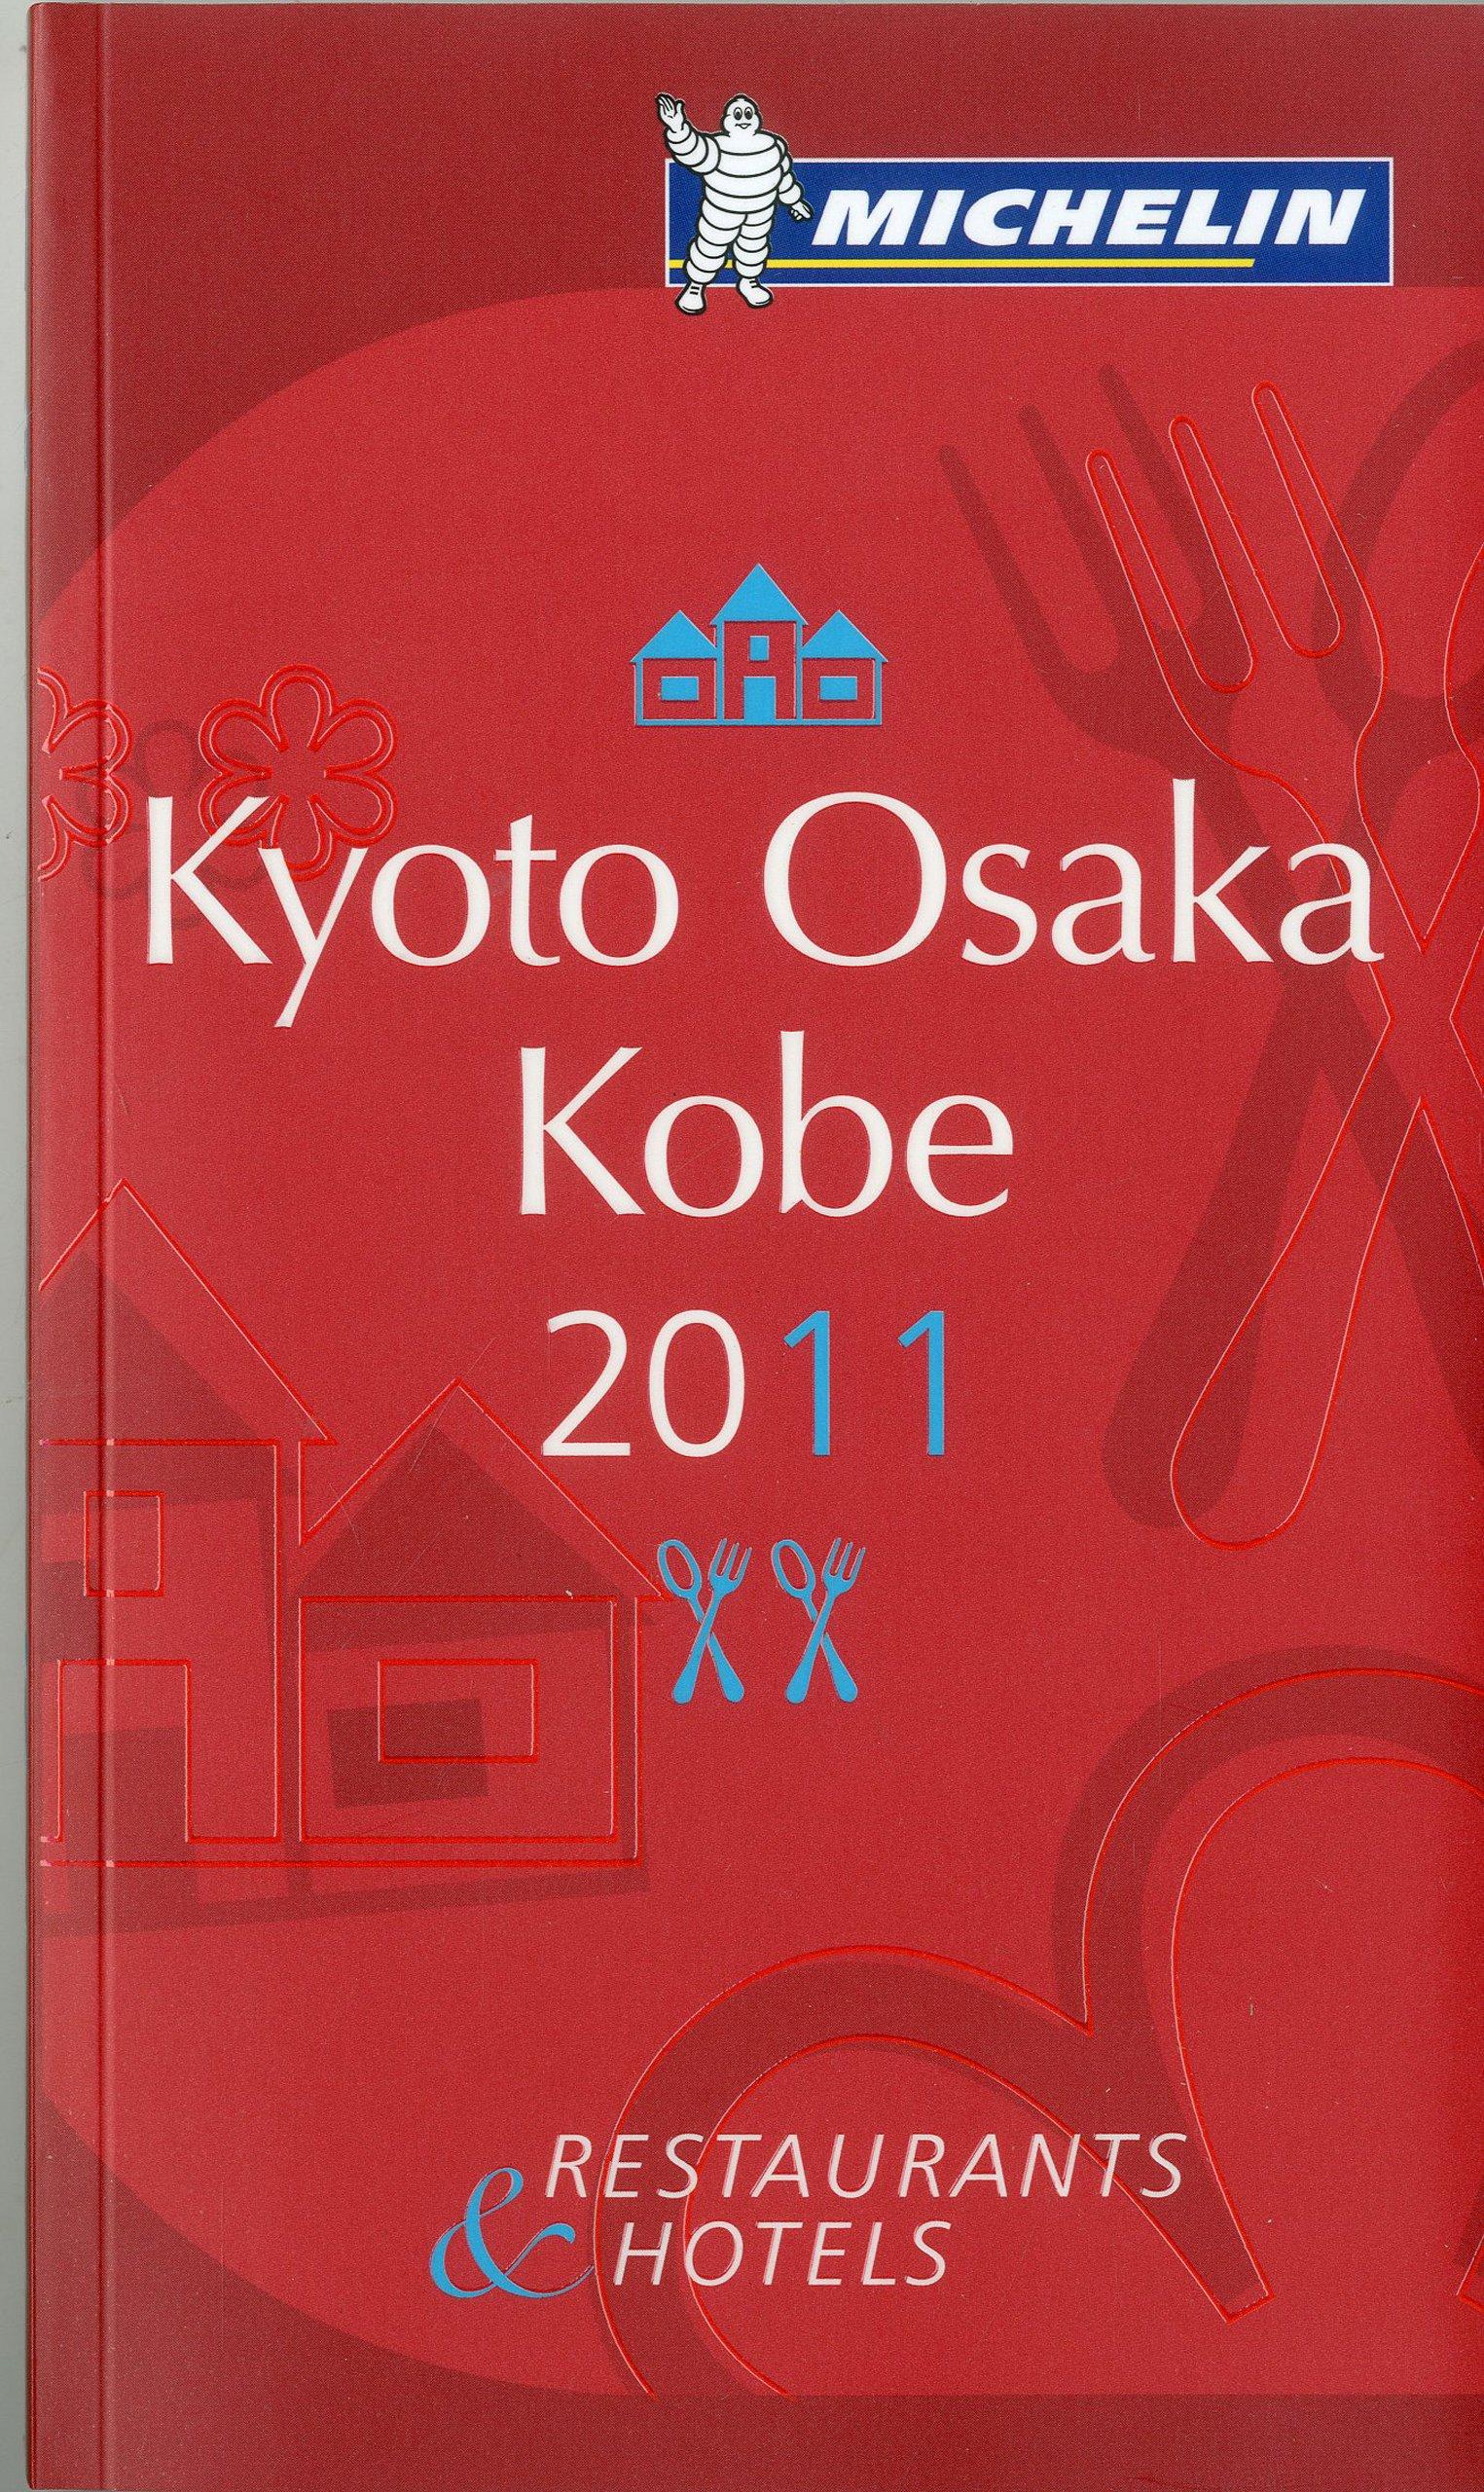 Michelin Red Guide Kyoto Osaka Kobe 2011: Hotels and Restaurants pdf